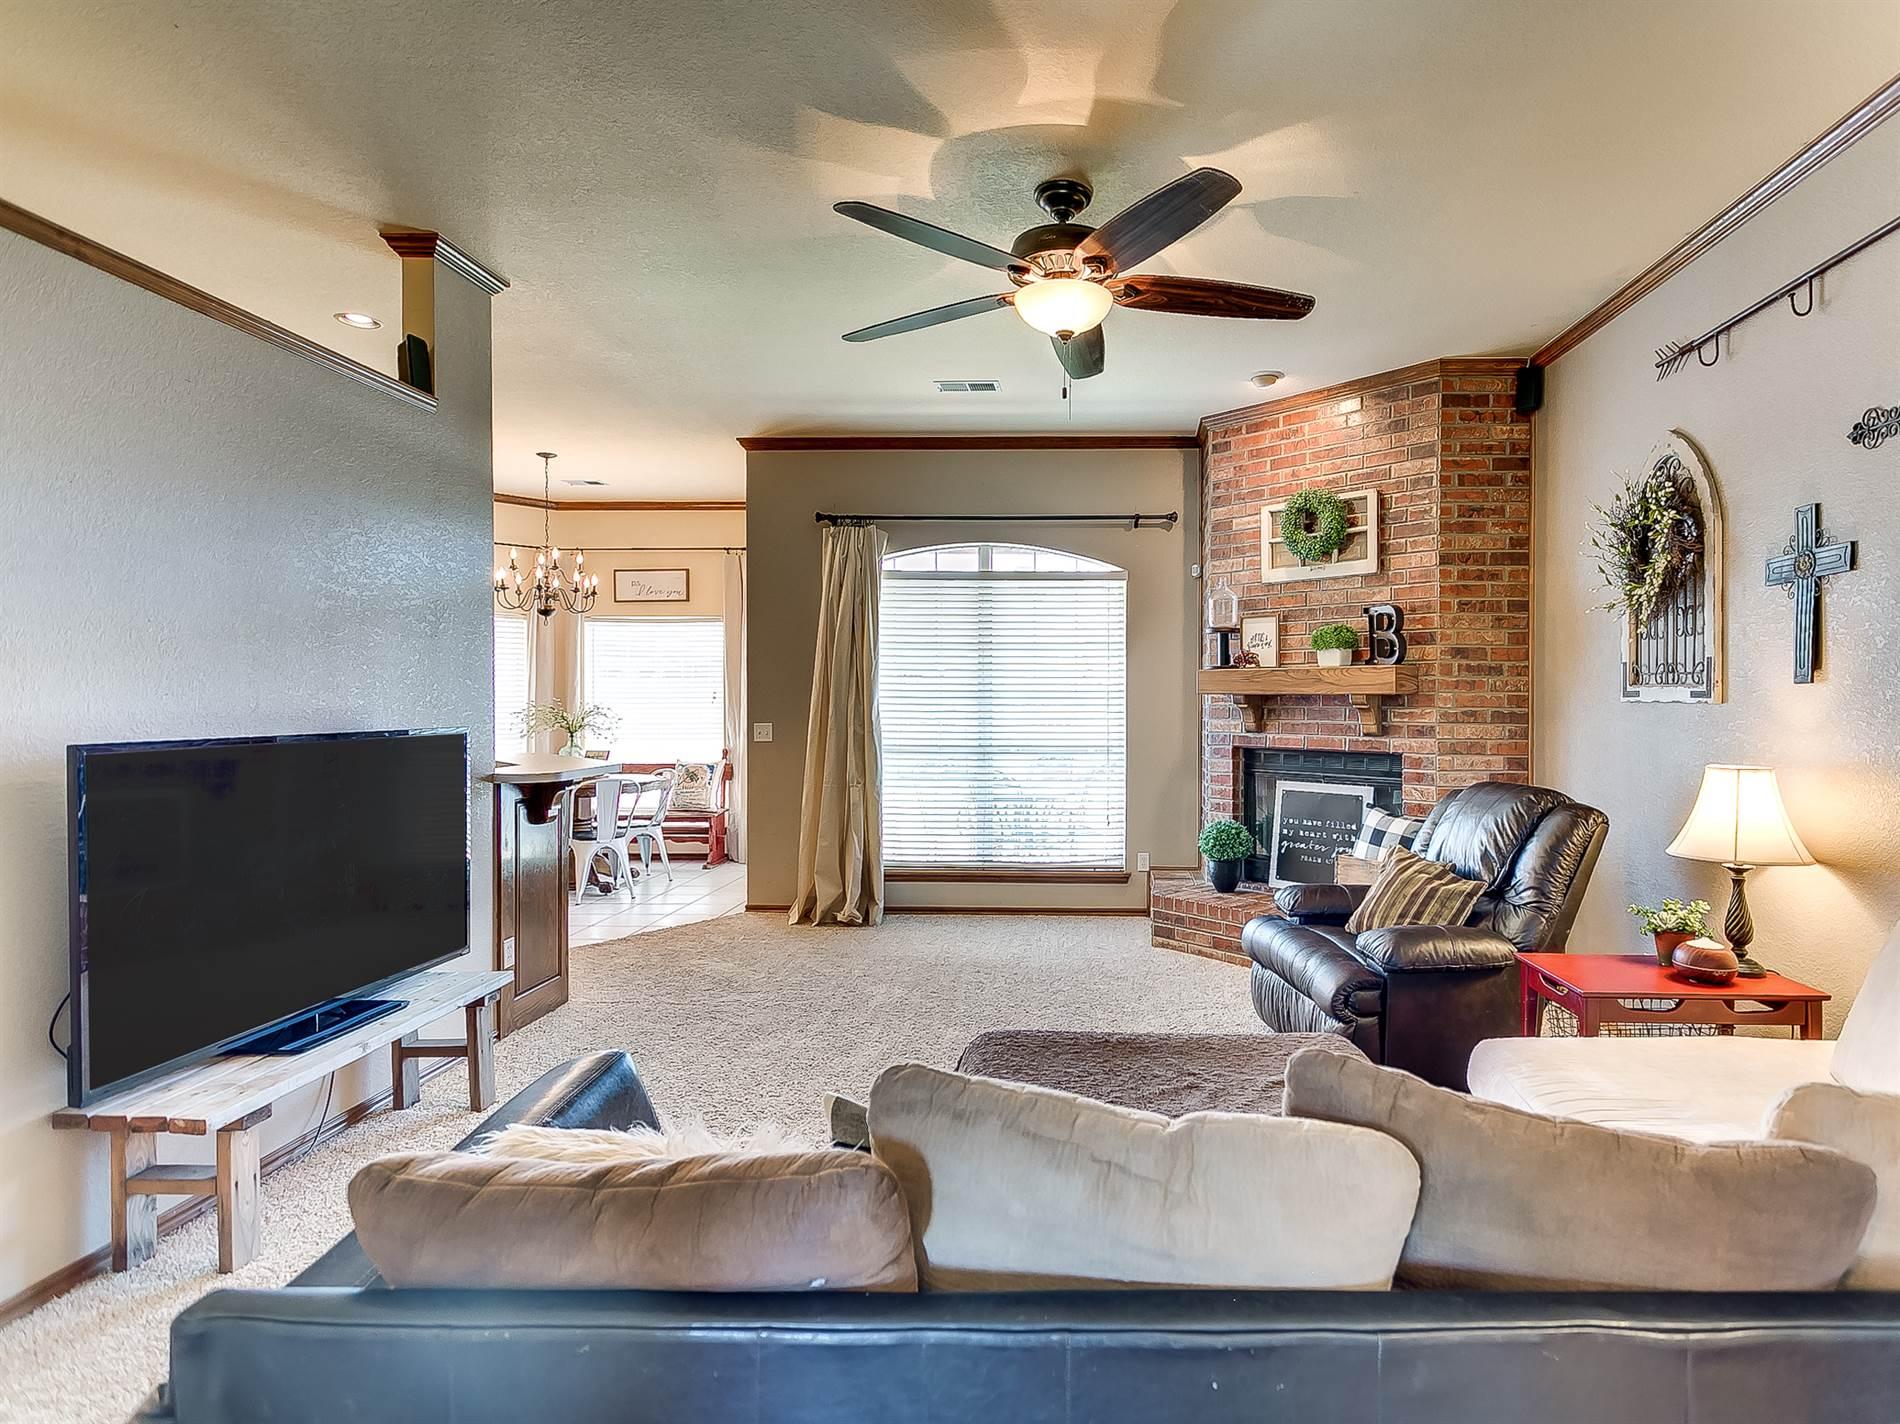 528 SW 153RD ST, Oklahoma City, OK 73170